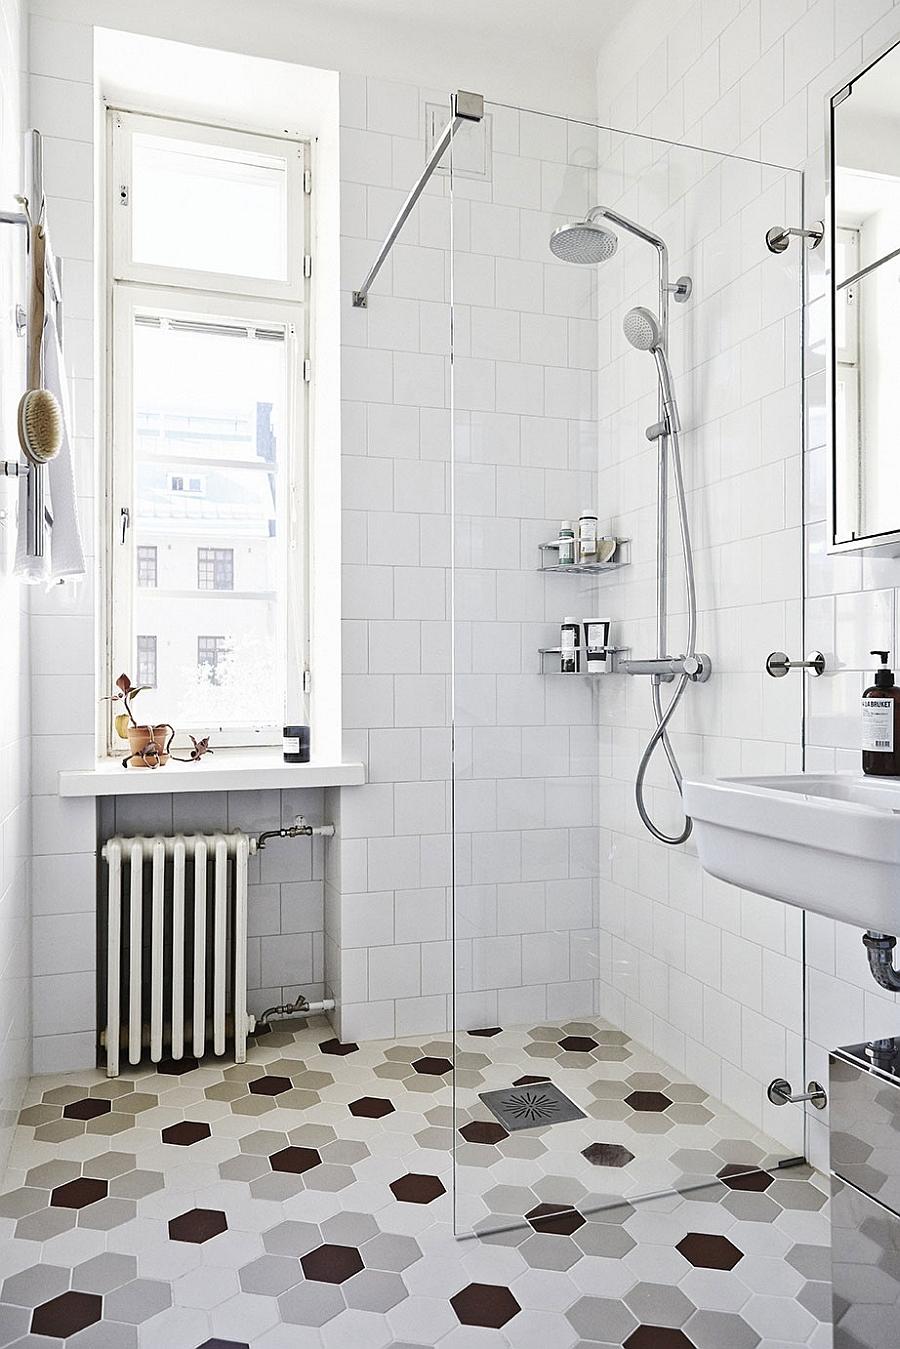 Helsinki Apartment Displays Scandinavian Design at its Finest